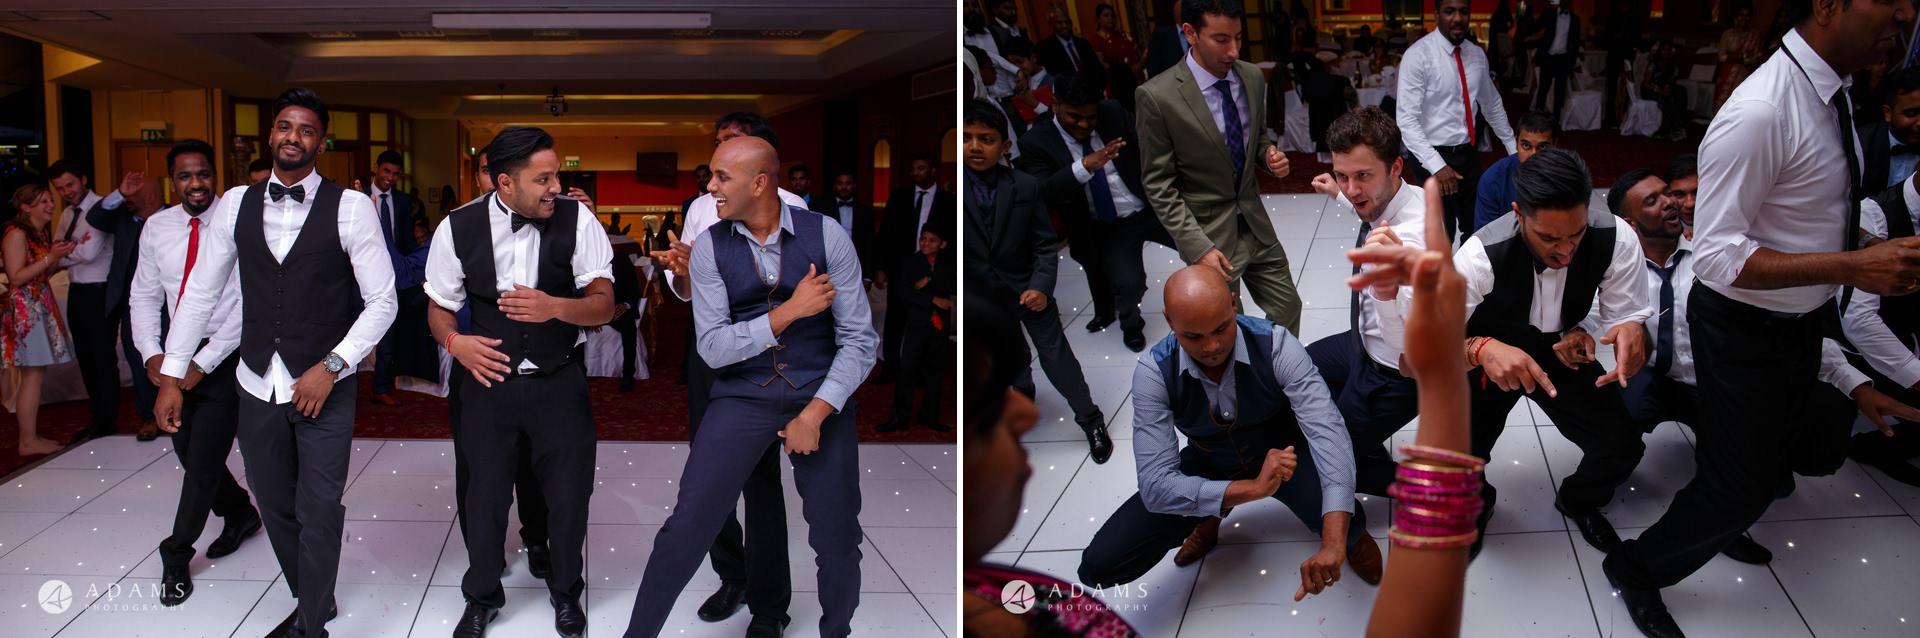 Baylis House Wedding Photographer | Sara + Anojan 42